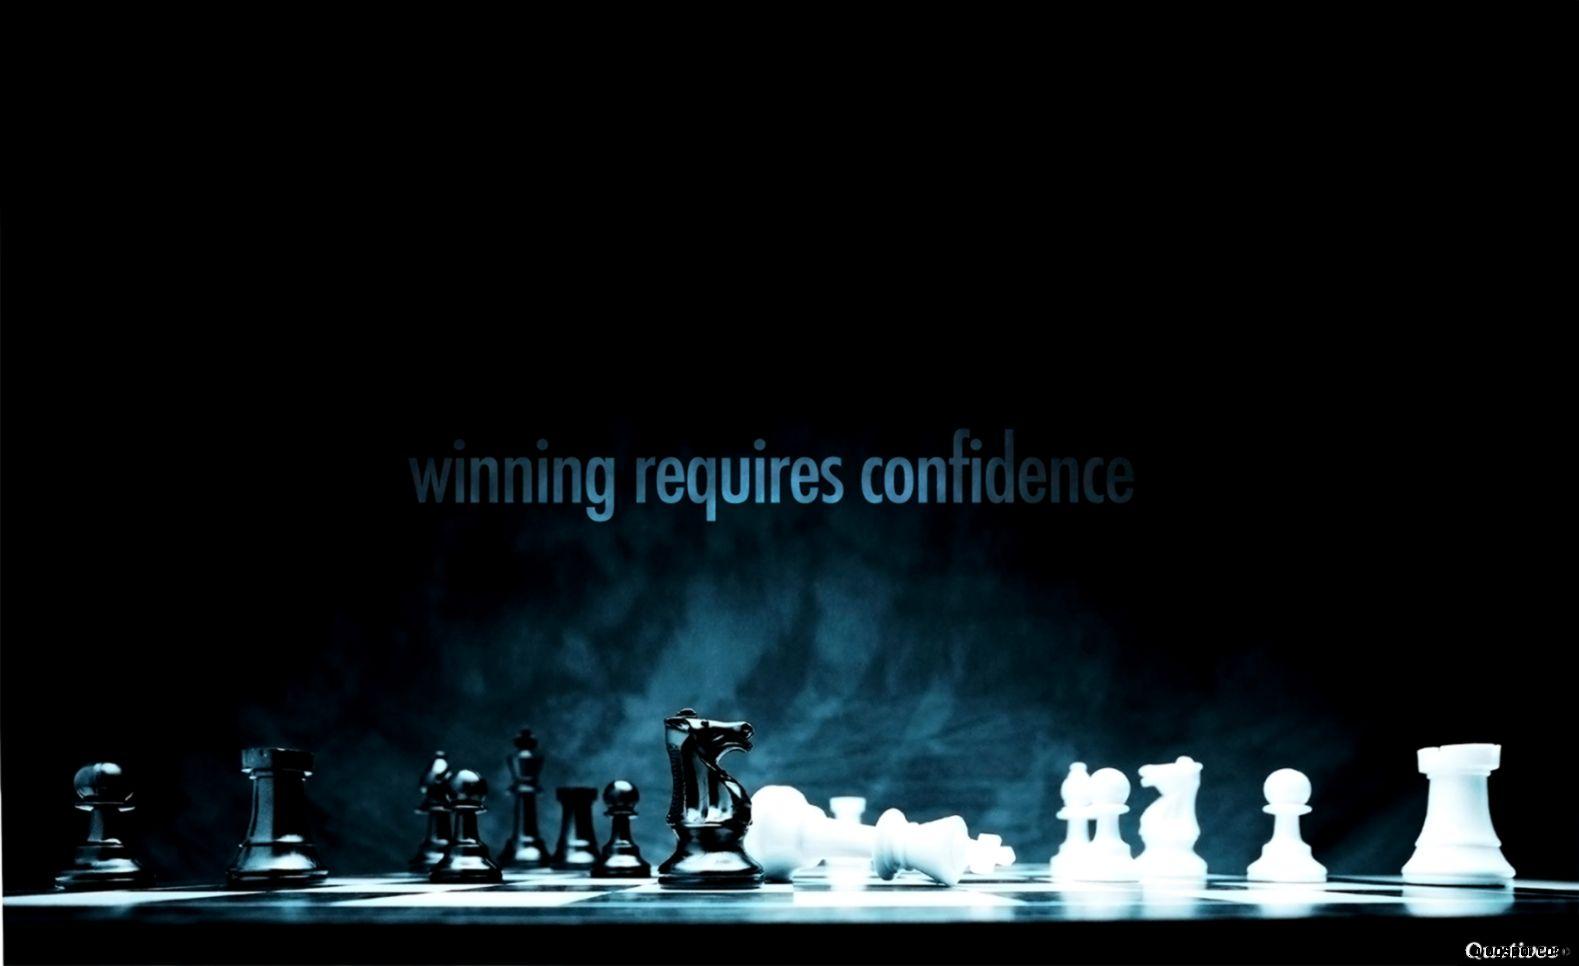 Winning requires confidence   Motivational Quote Wallpaper  Quotivee